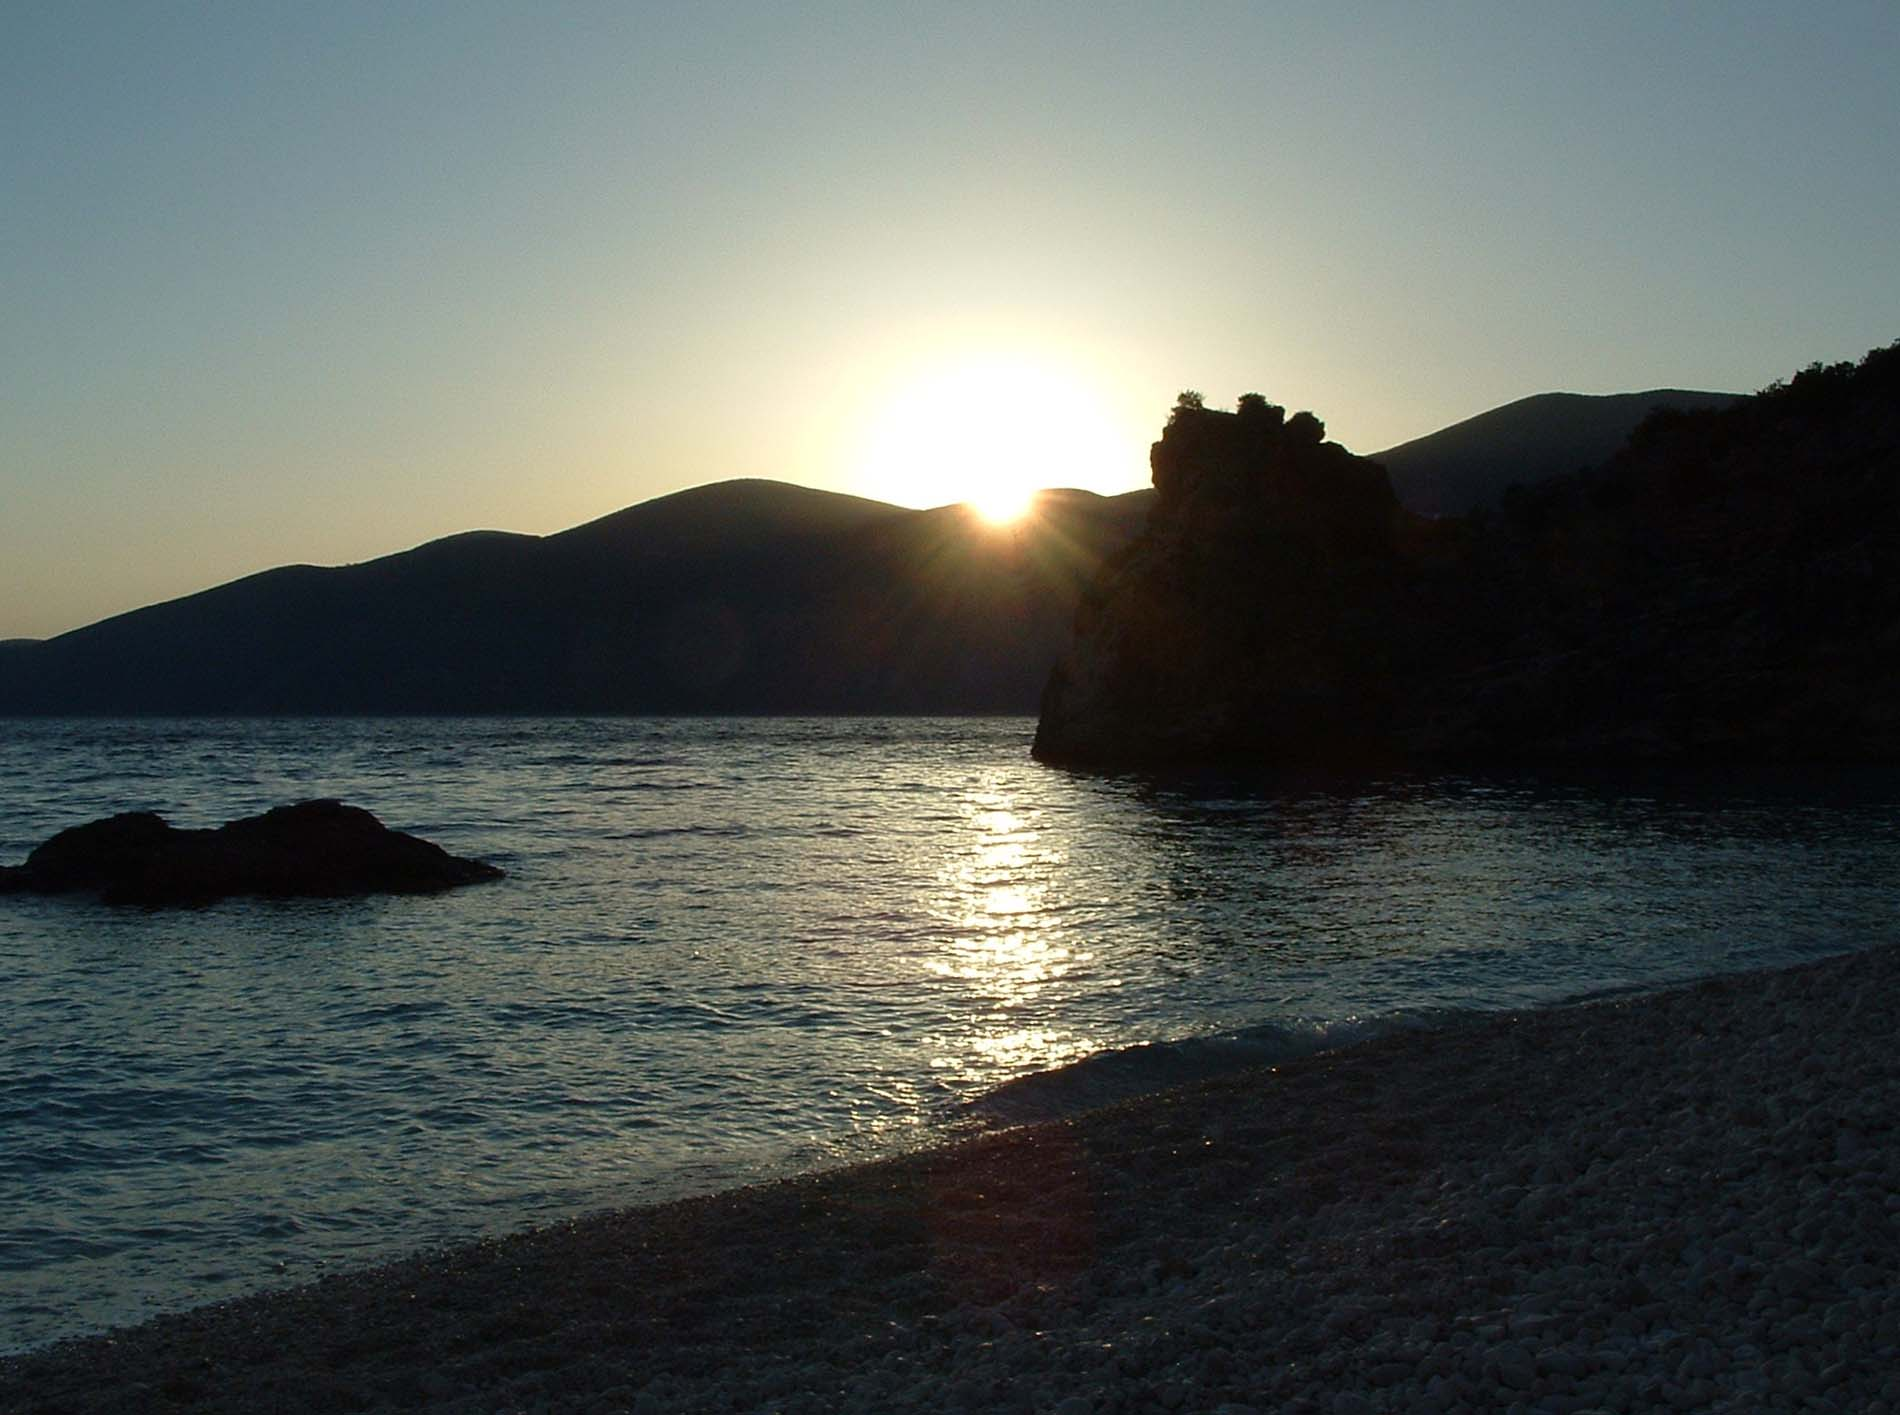 51 Ag Fili tramonto